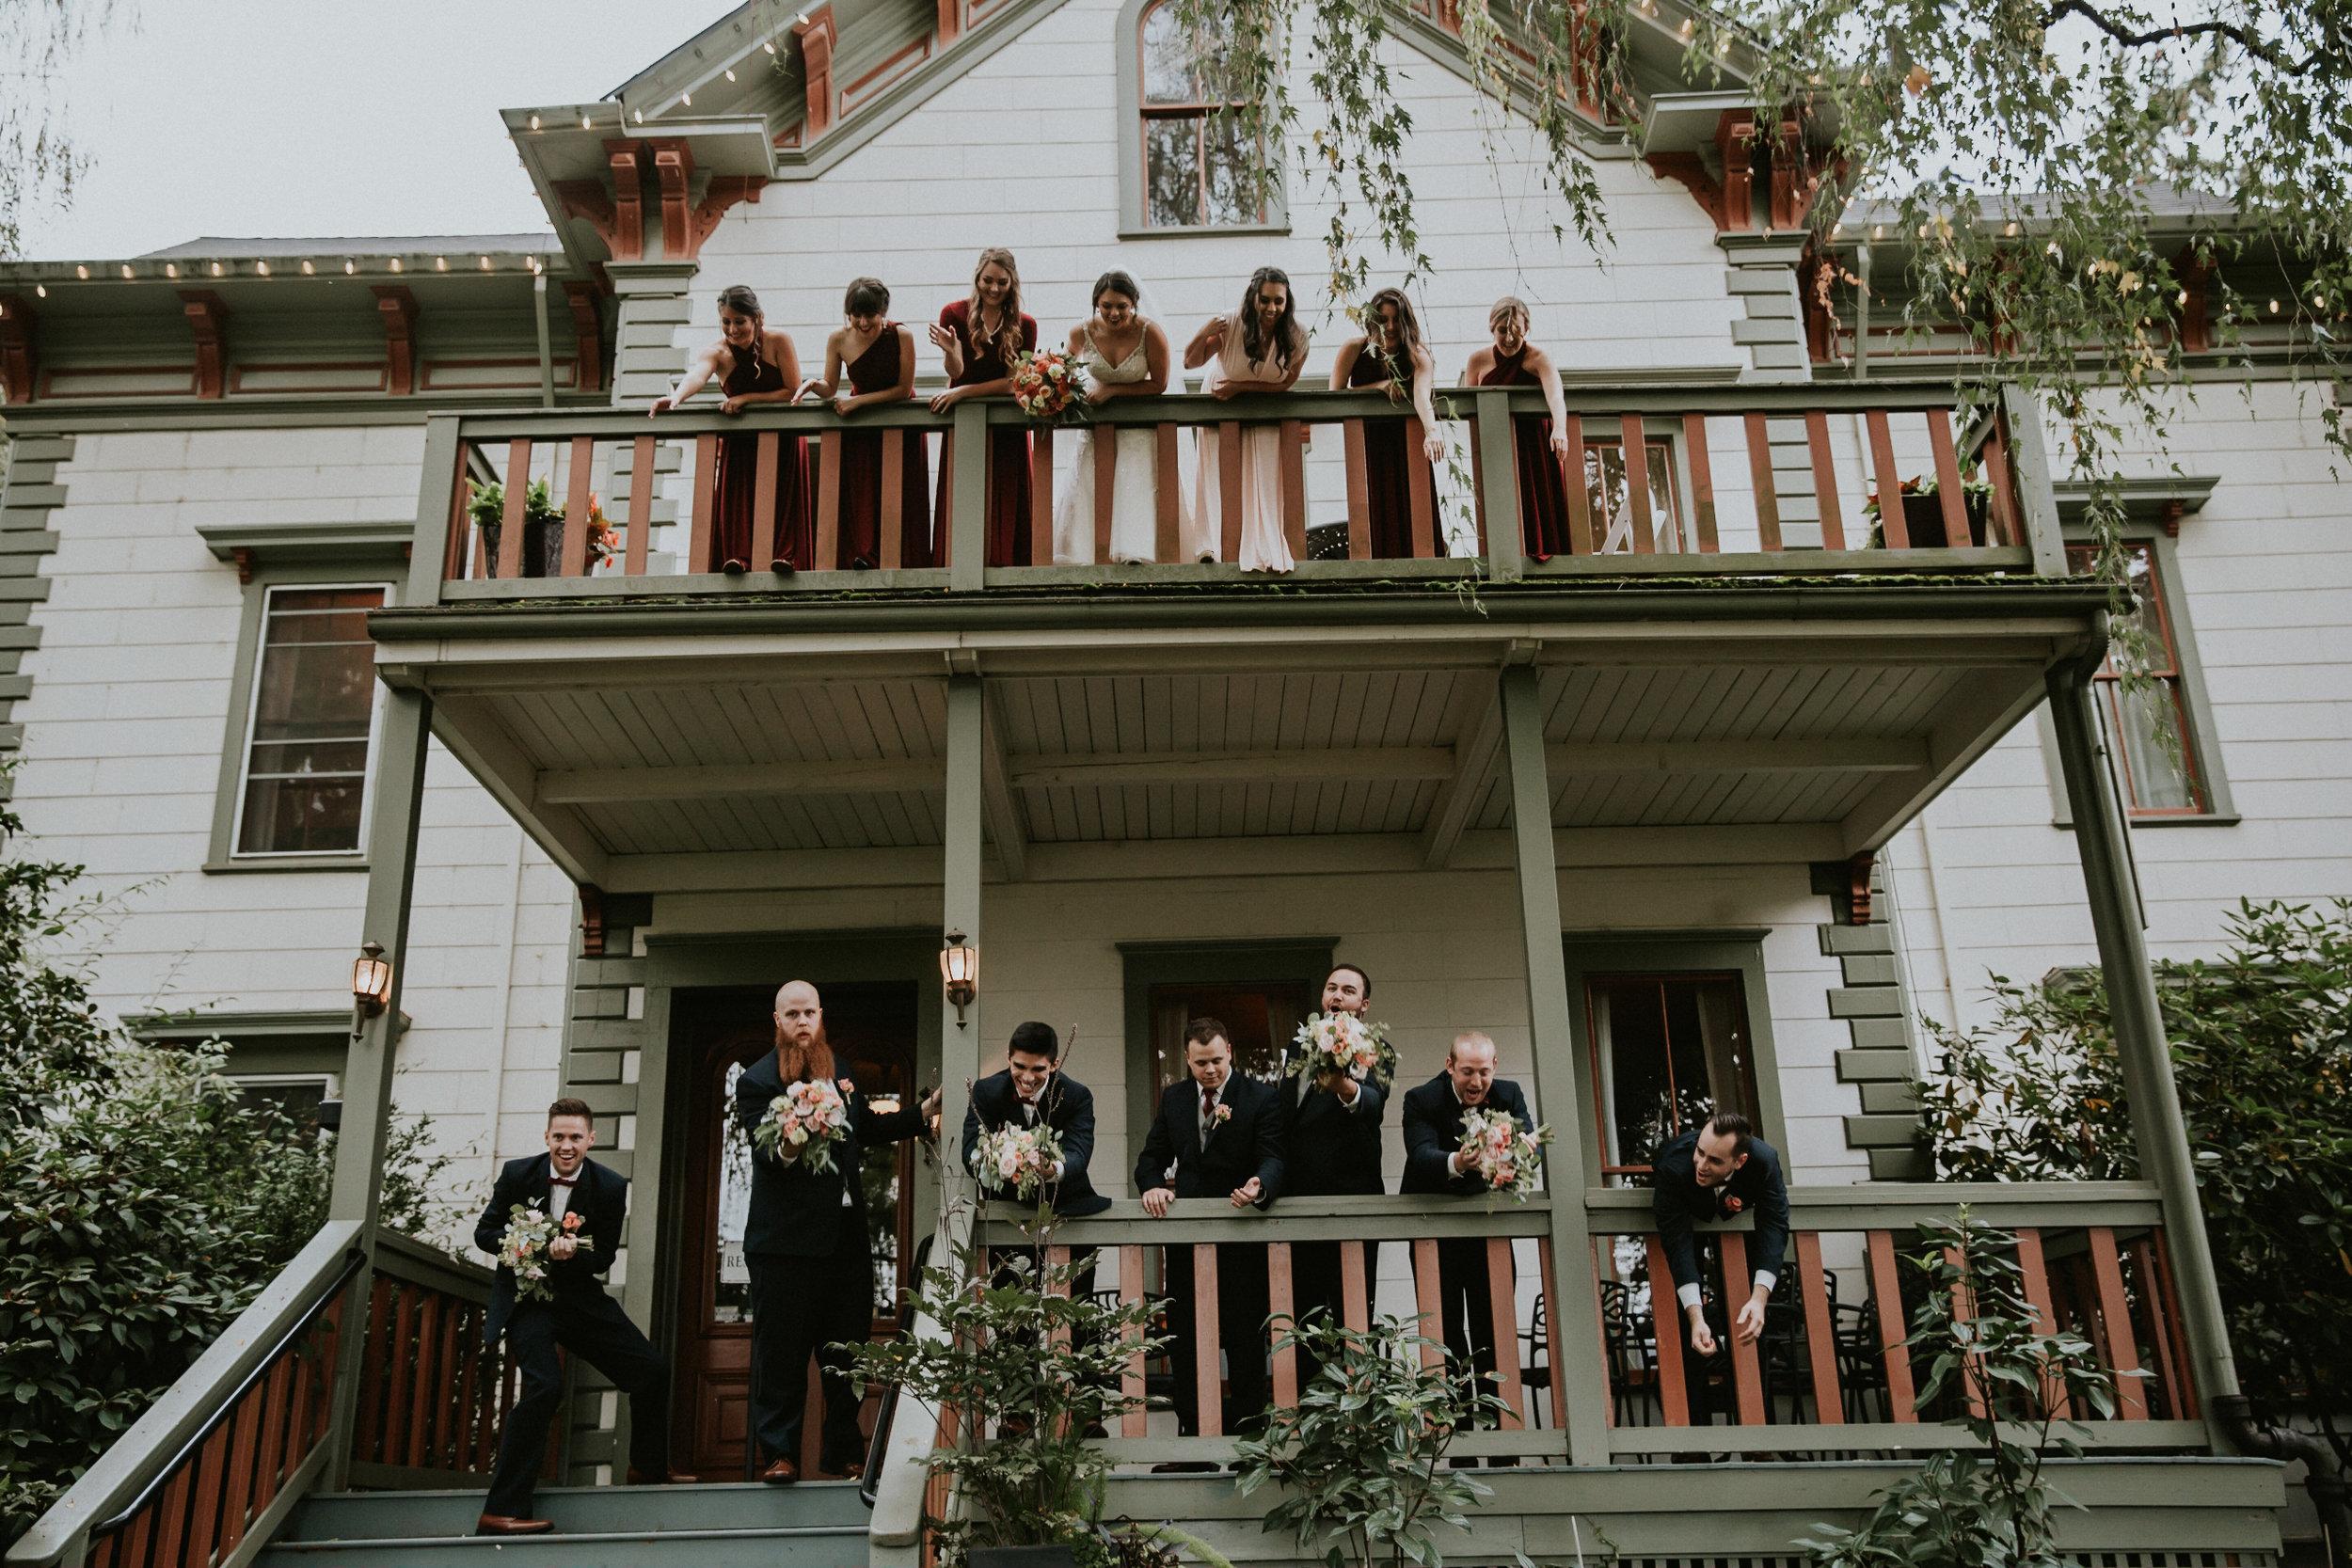 McMenamins_Cornelious_Pass_Roadhouse_wedding_photographer_AlfredTang-9.jpg